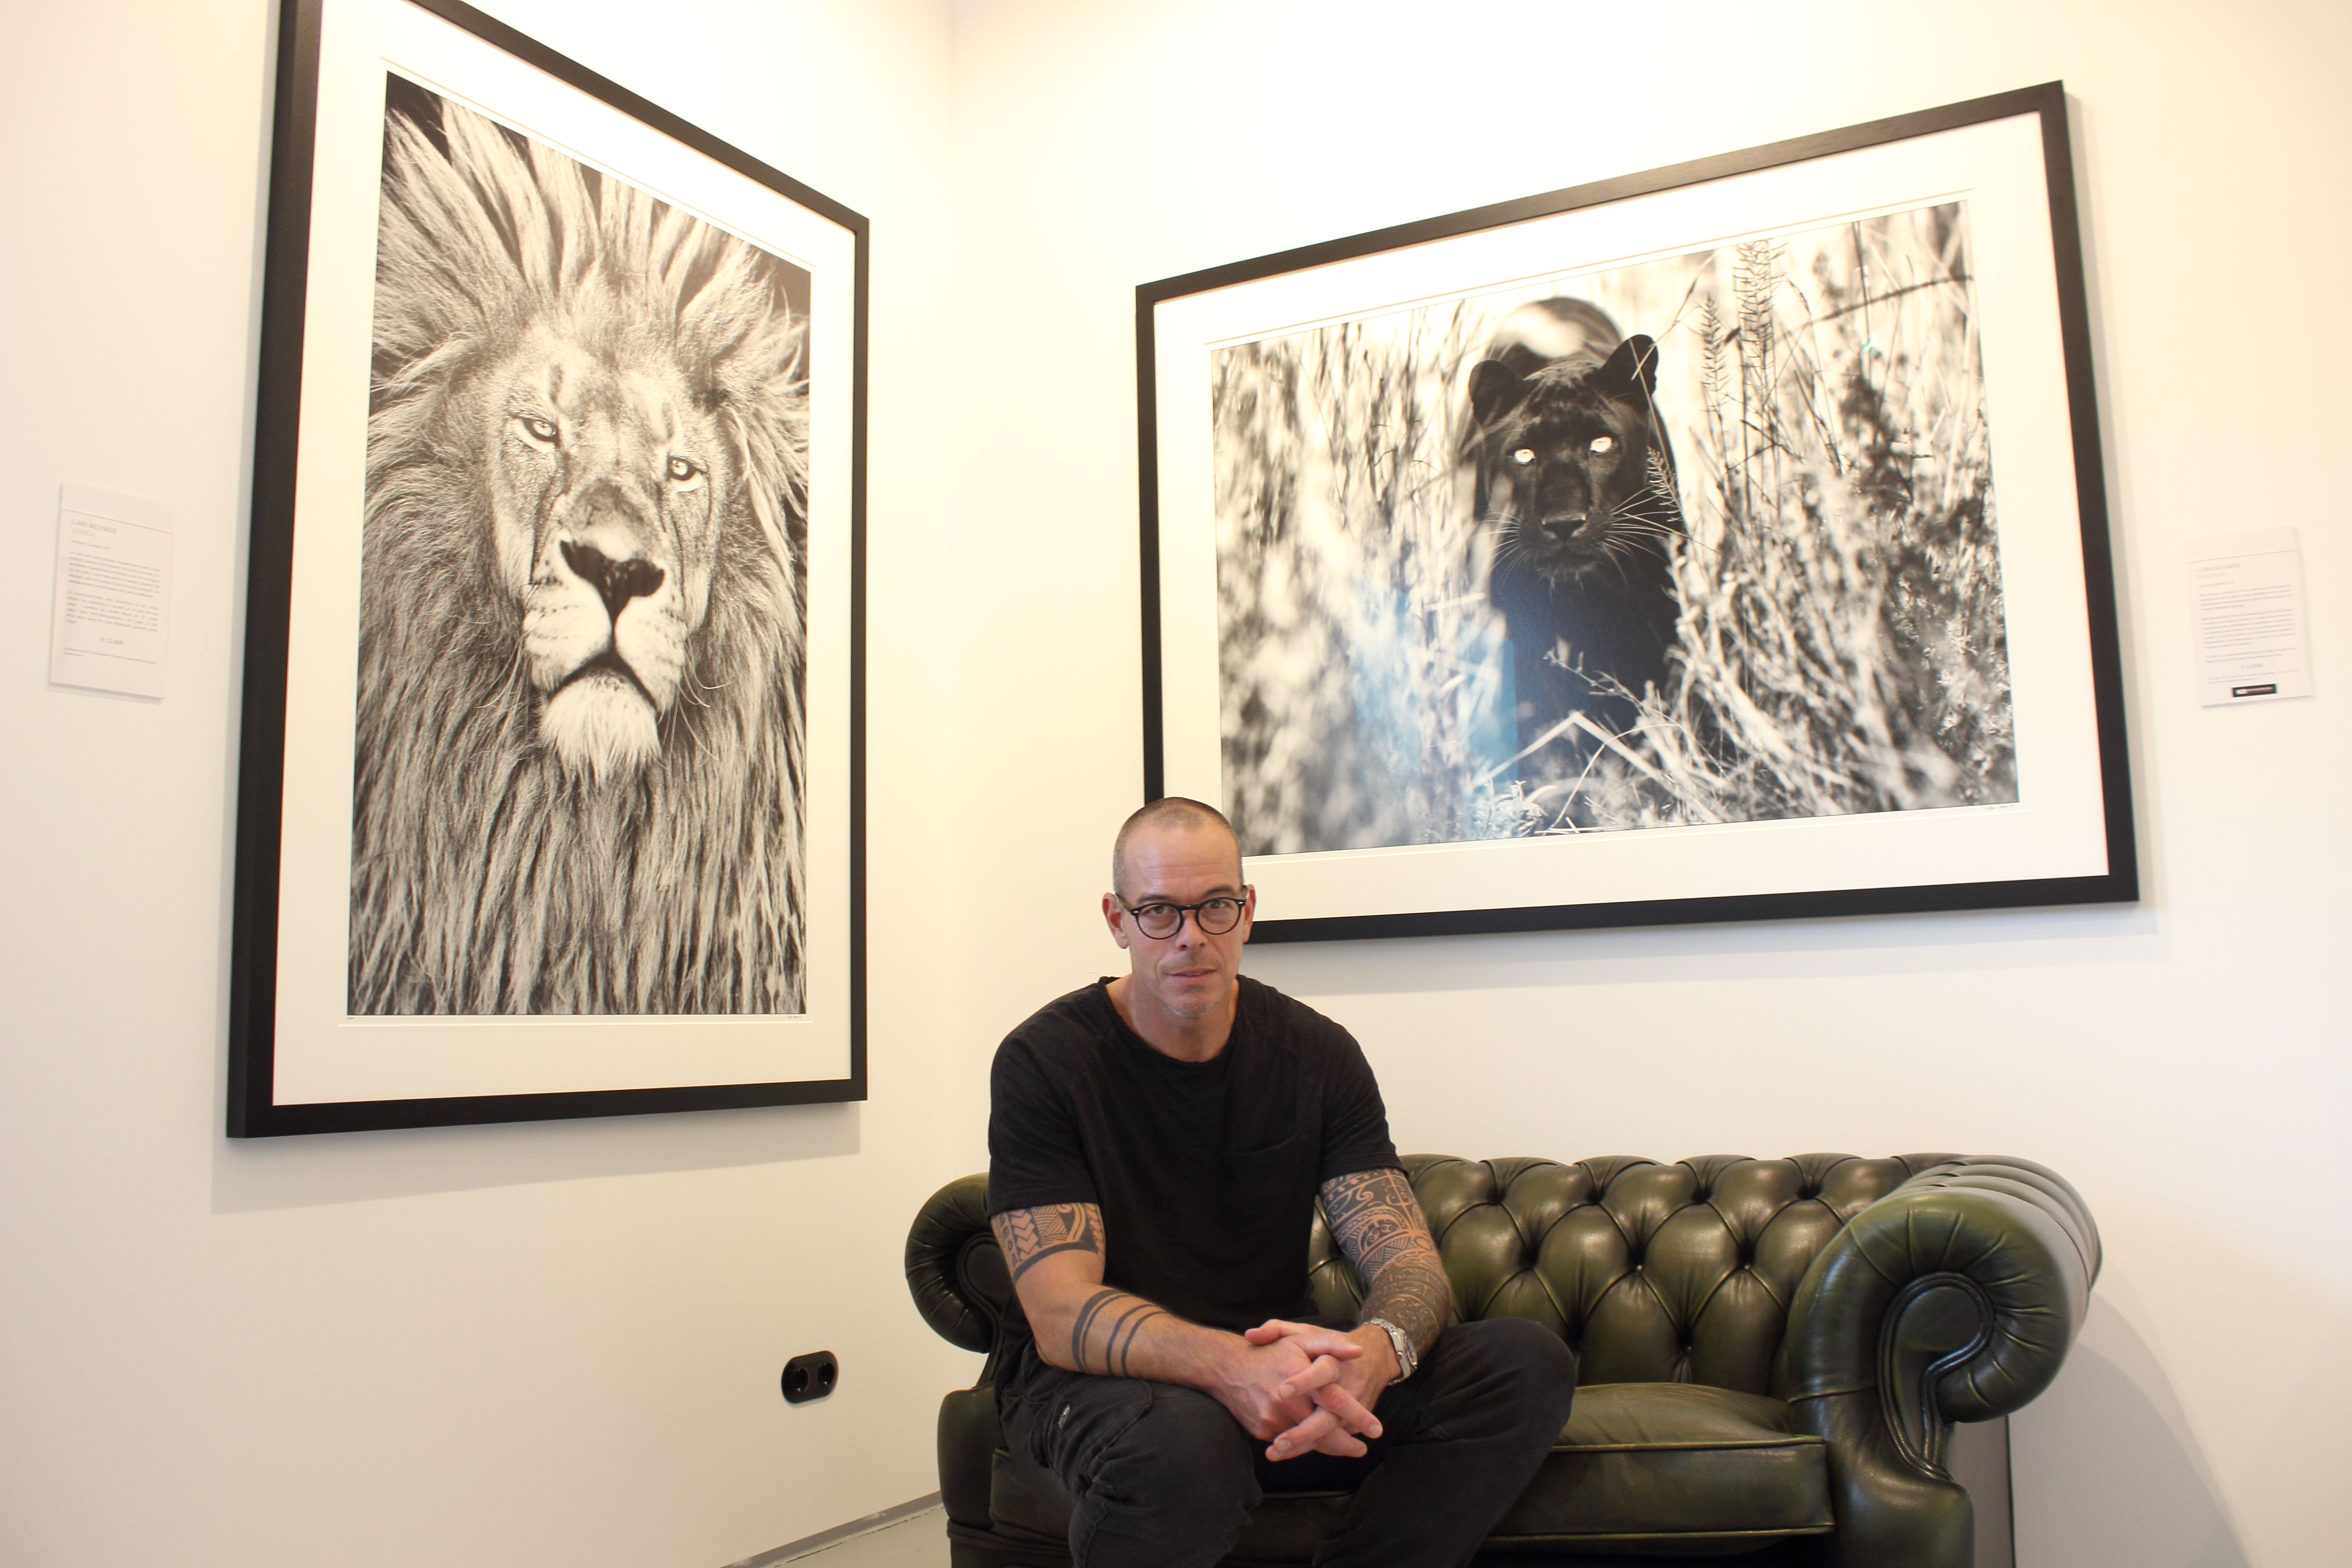 Lars Beusker 159 Gallery